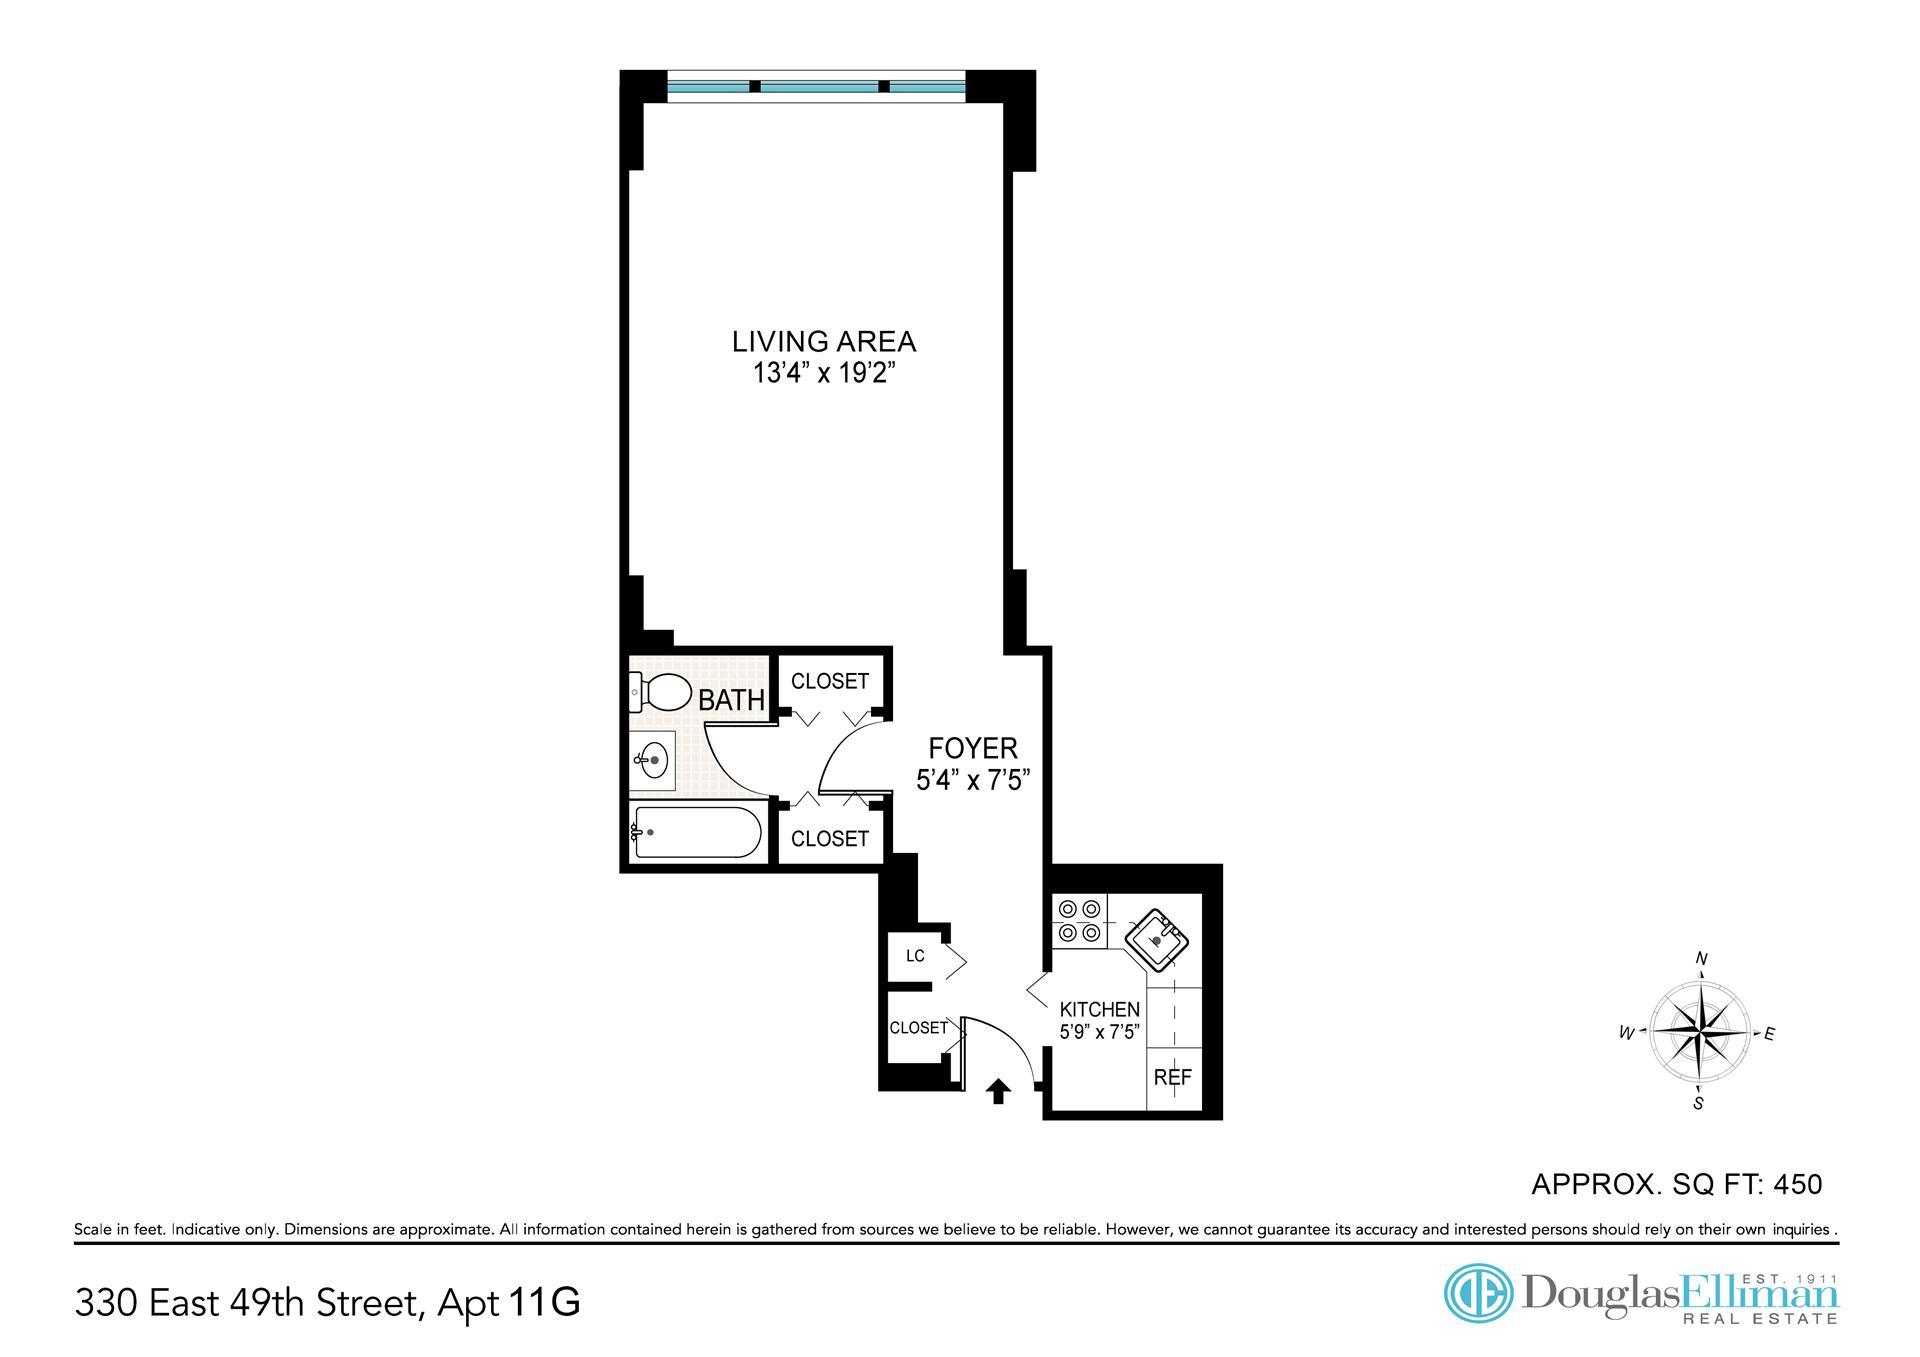 Floor plan of 330 East 49th St, 11G - Turtle Bay, New York